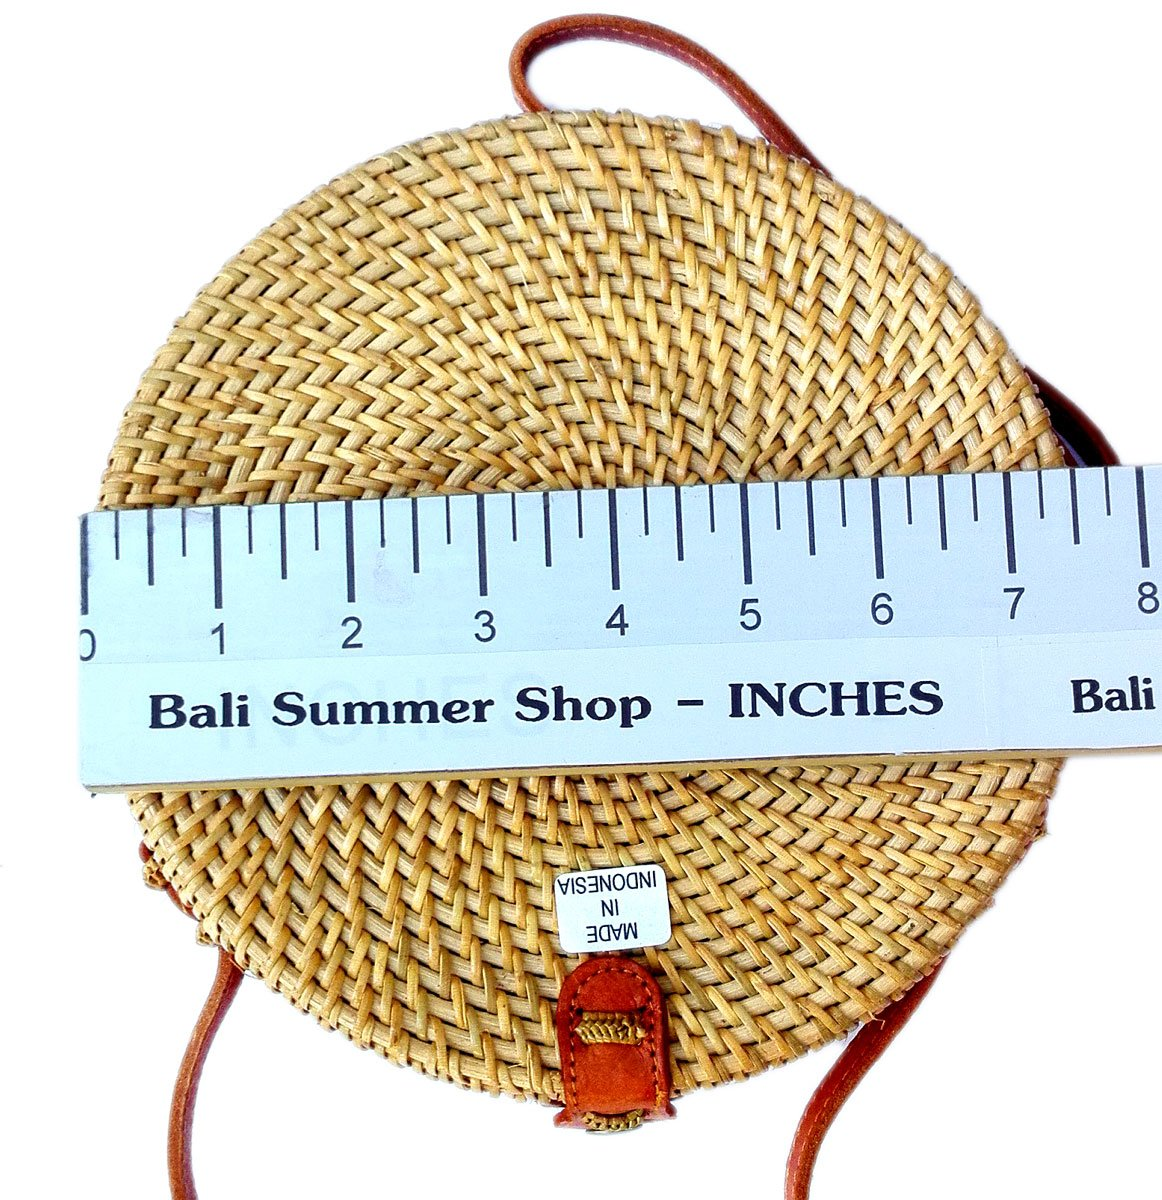 Bali Rattan - Handwoven Round Rattan Bag (Plain Weave Leather Closure) by Bali Rattan (Image #3)